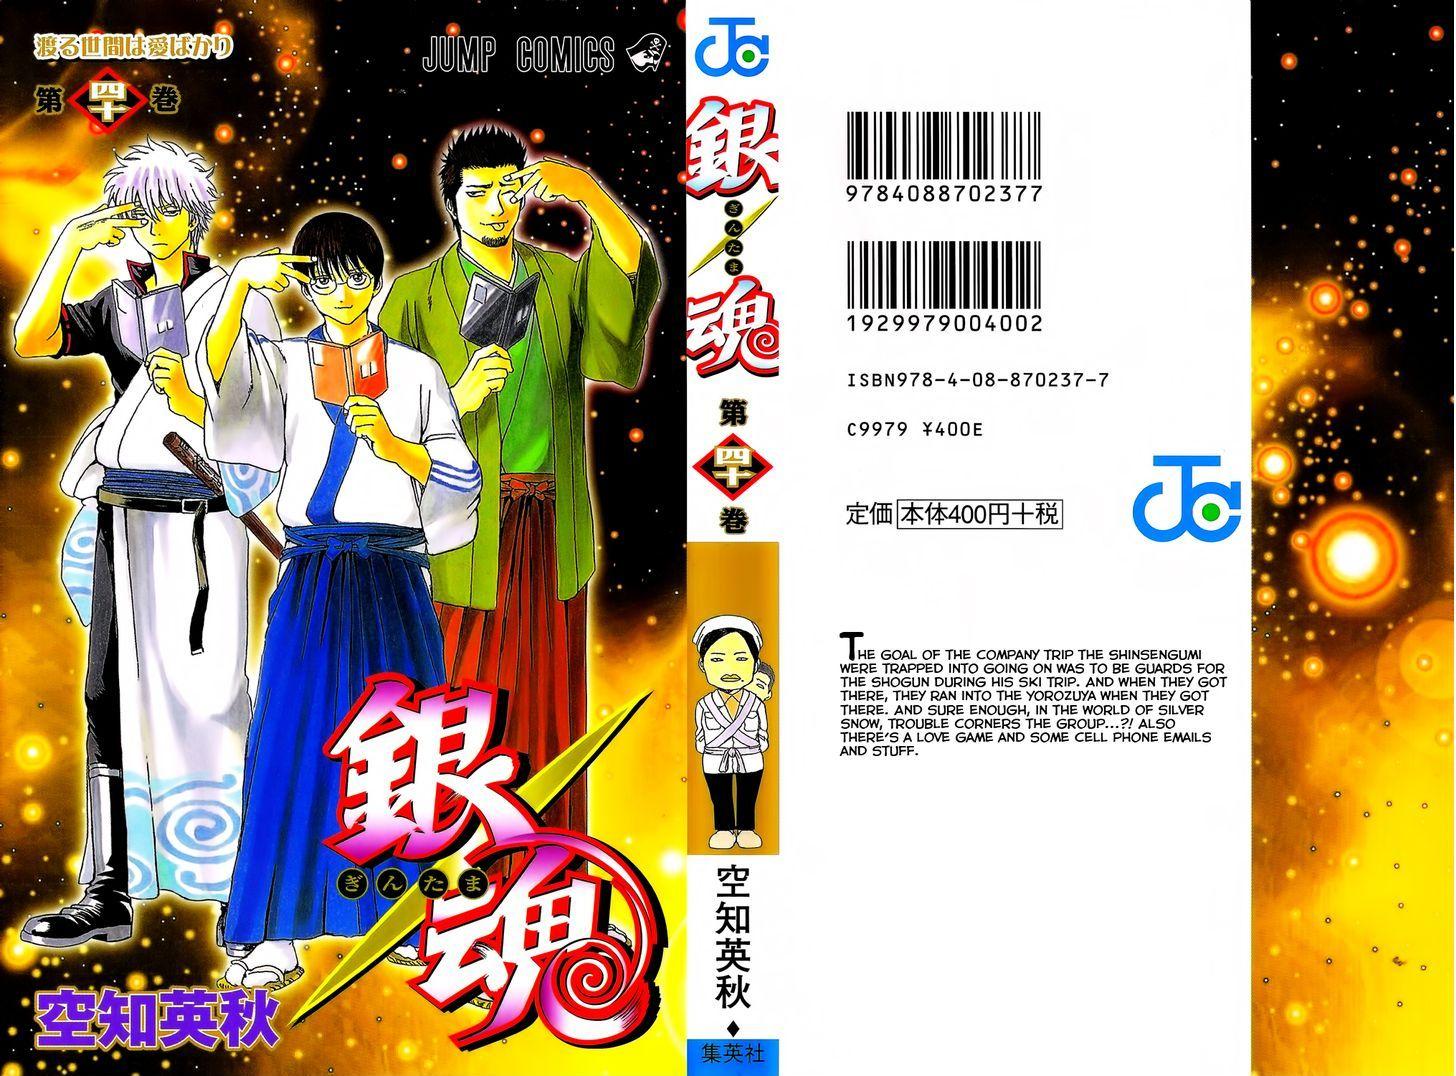 http://im.nineanime.com/comics/pic9/18/210/17220/Gintama3440395.jpg Page 1